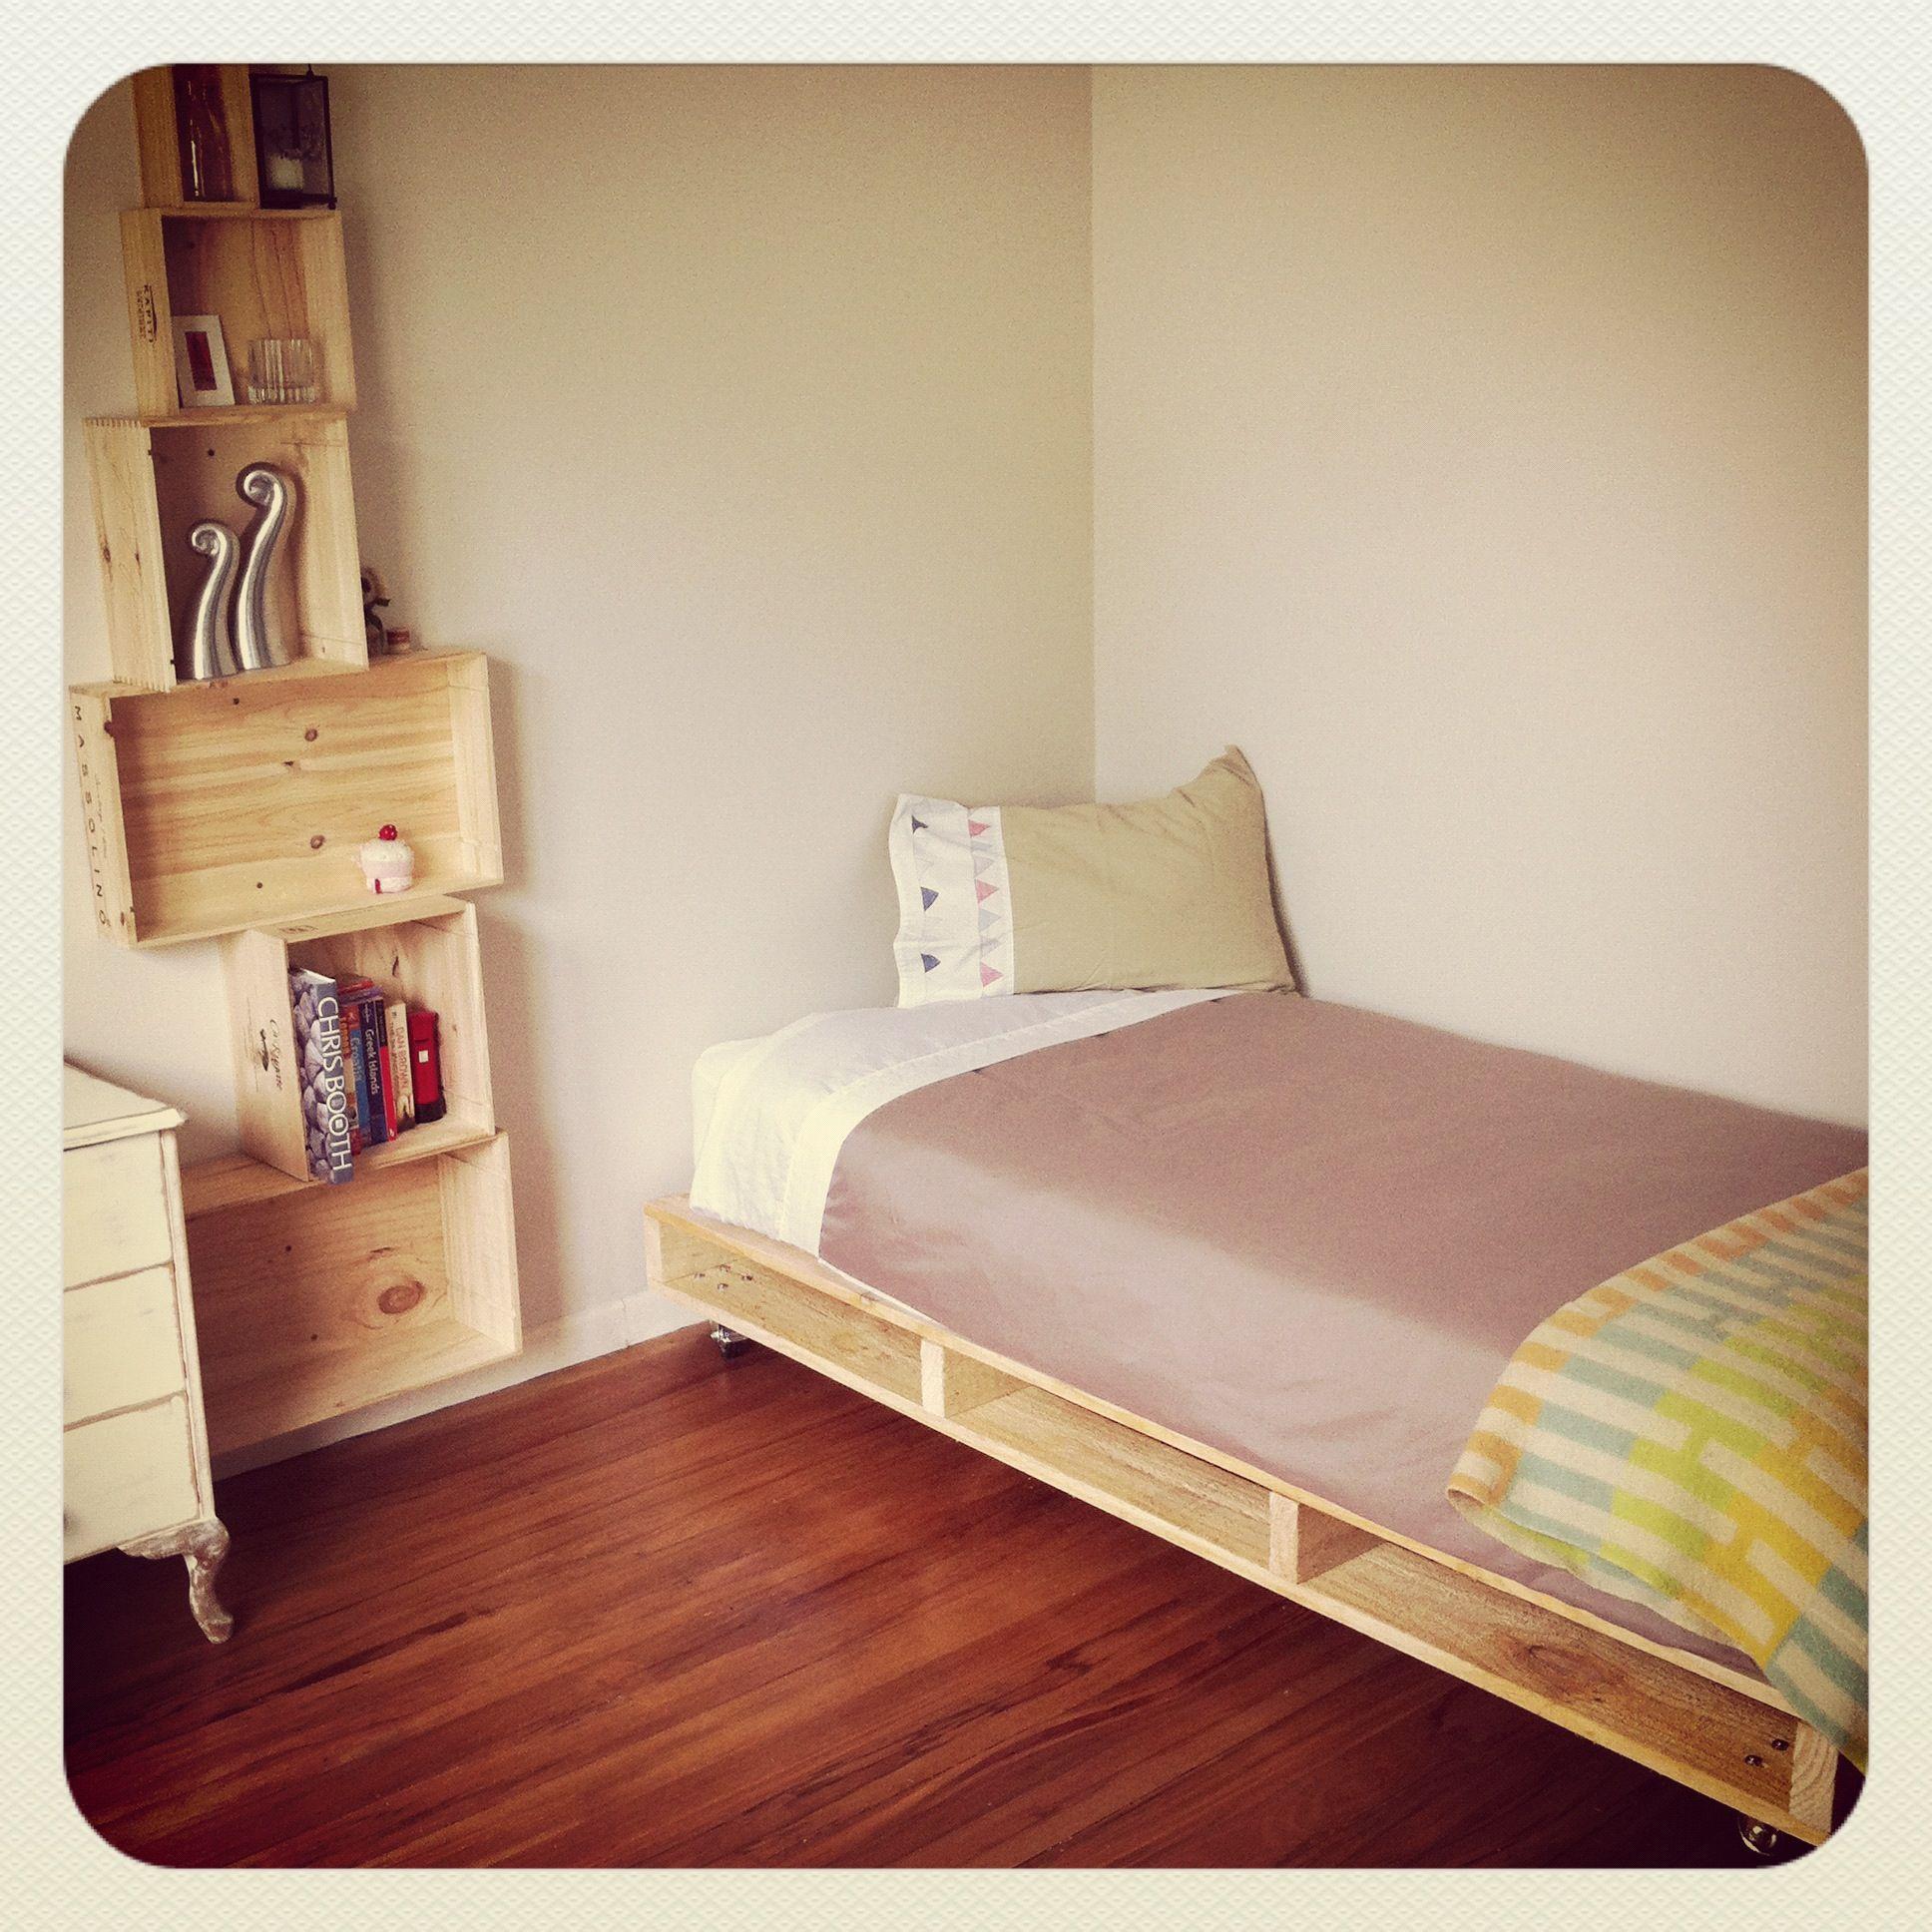 Wooden furniture box beds - Pallet Bed Wooden Box Shelf Storage